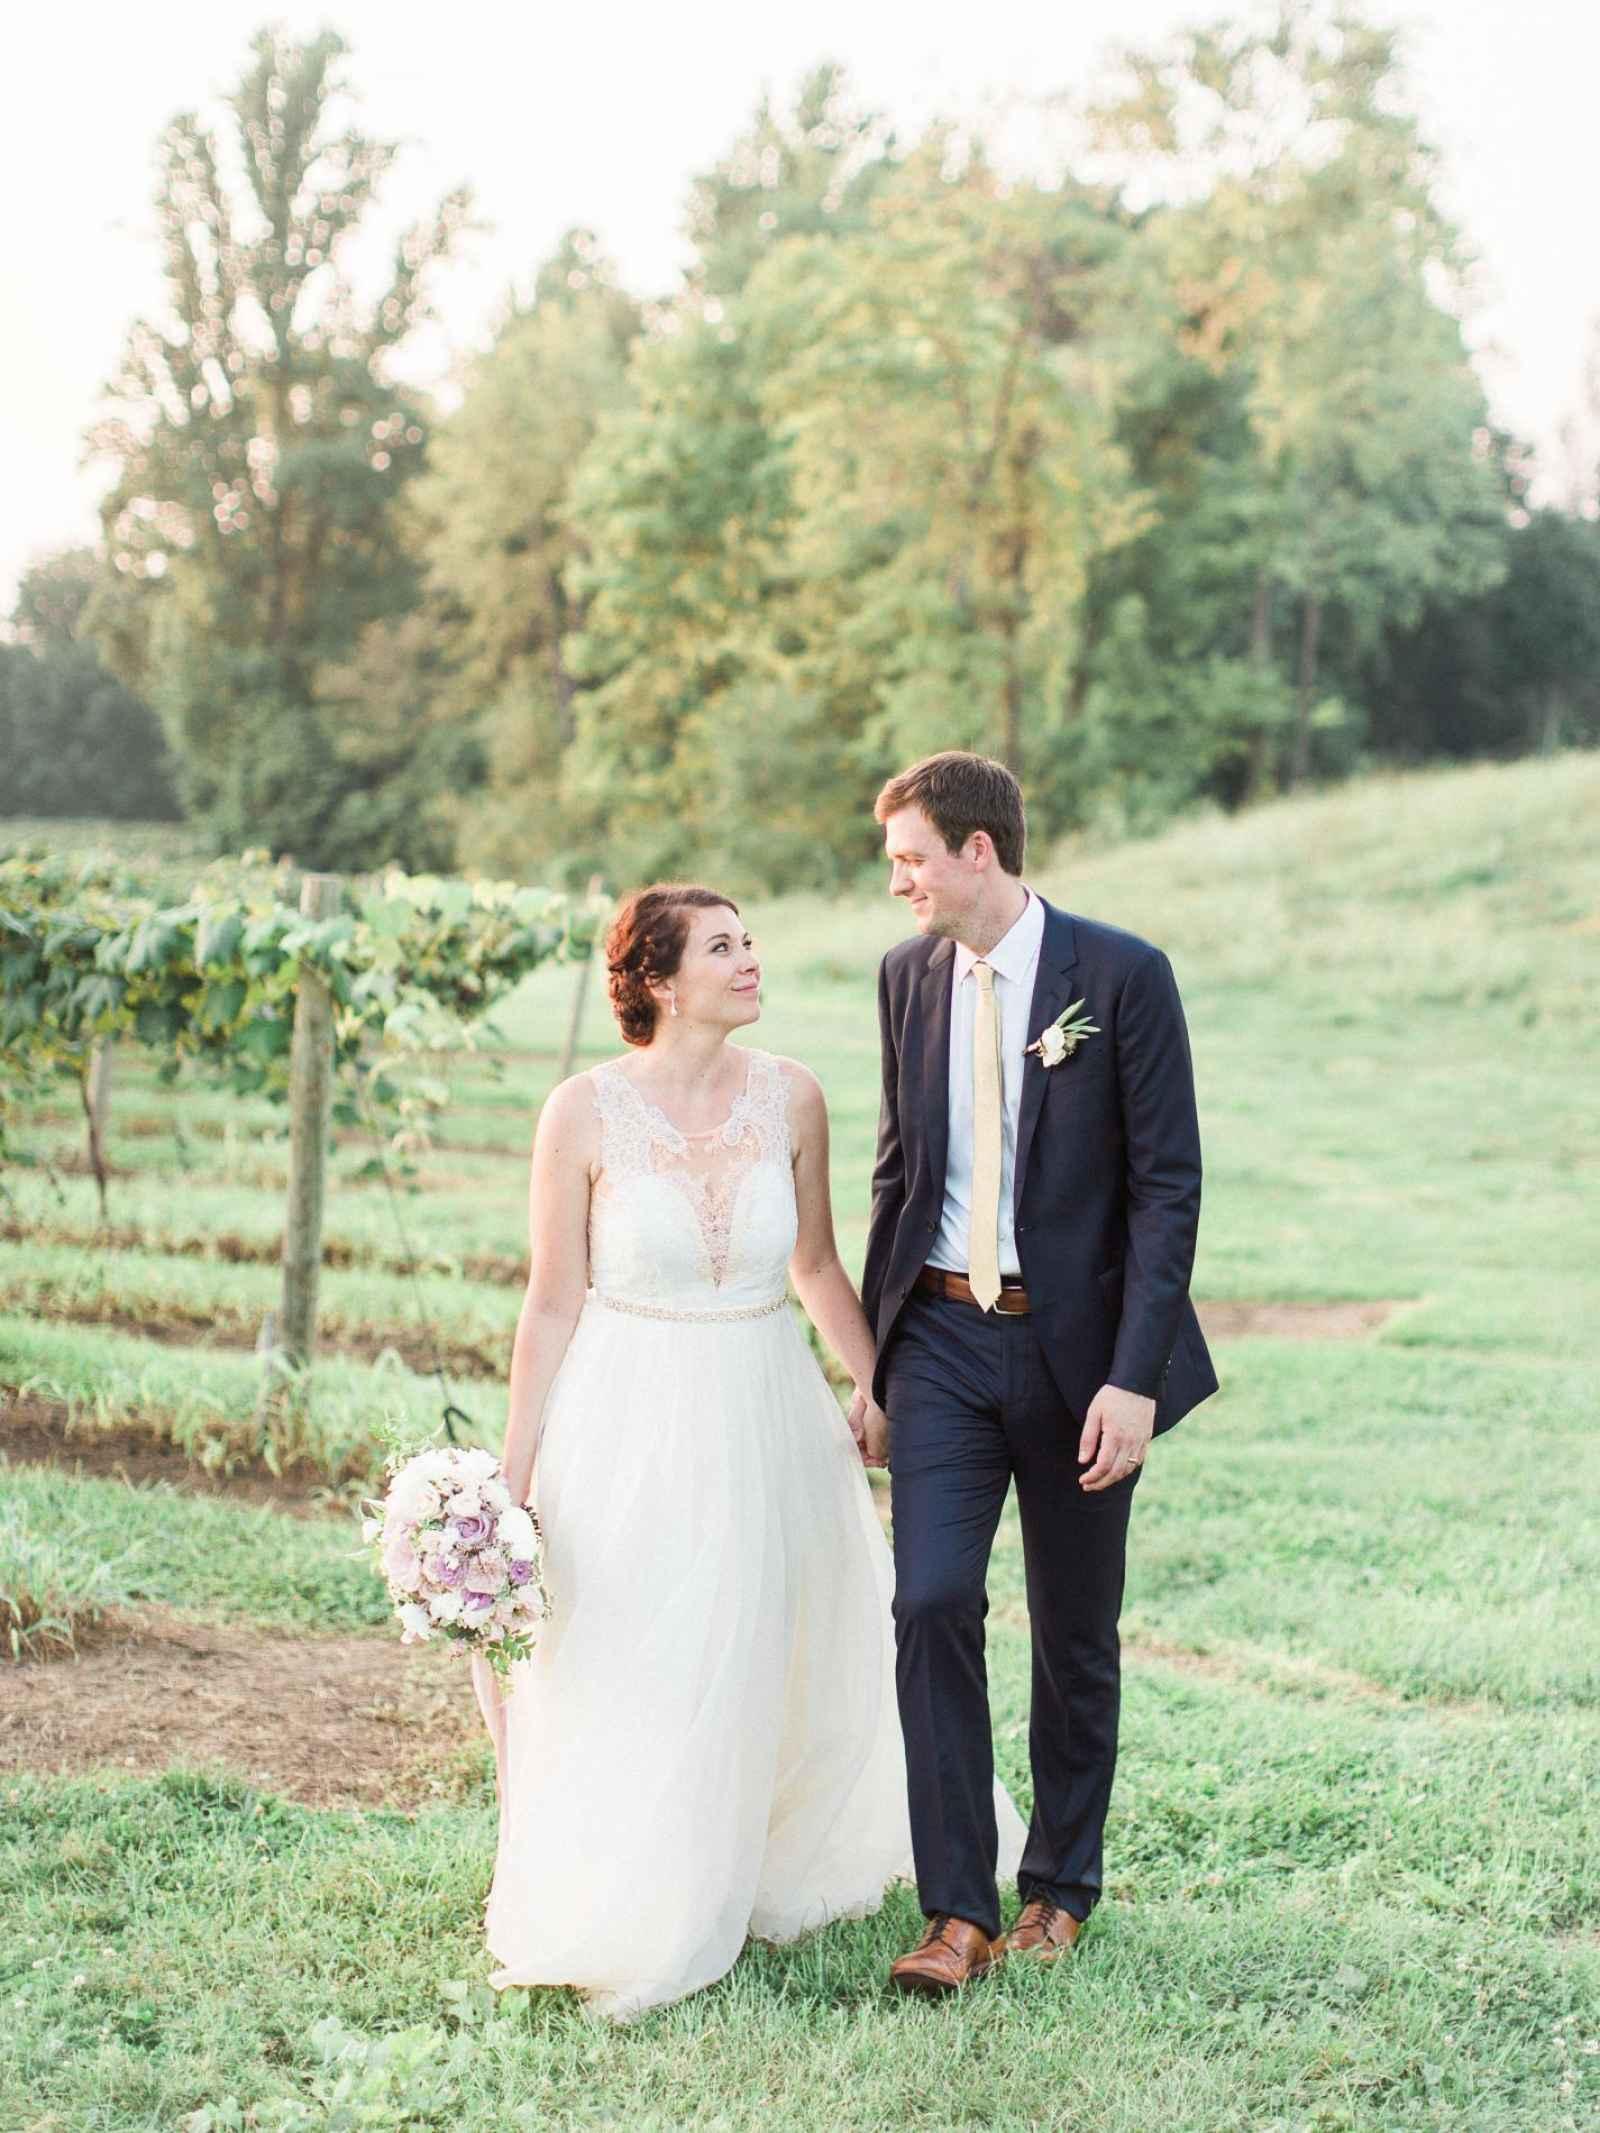 Patrick mcauliffe wedding